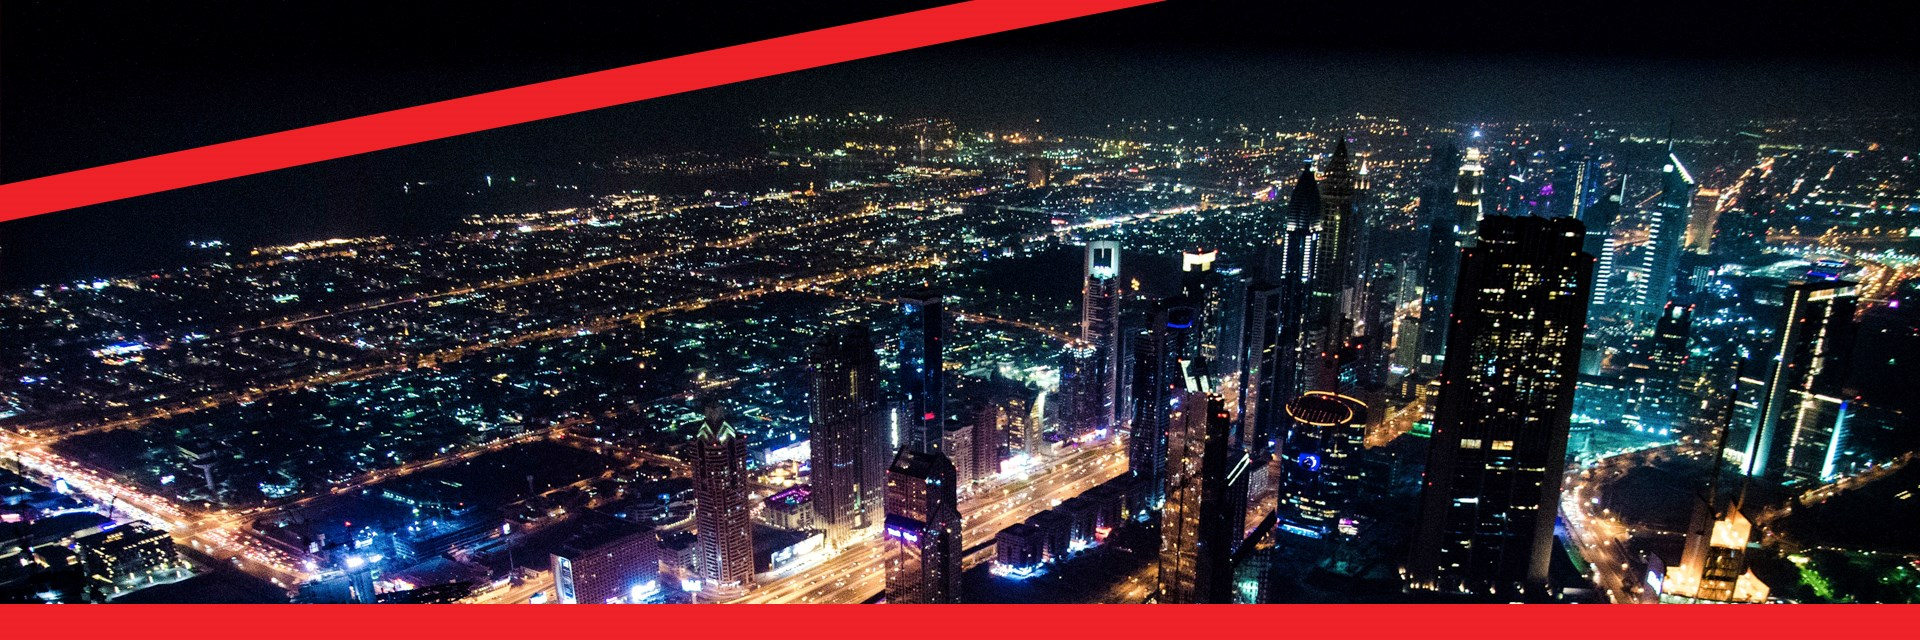 RM_FINANCIAL_CityFromAbove_WEB_STRIP.jpg